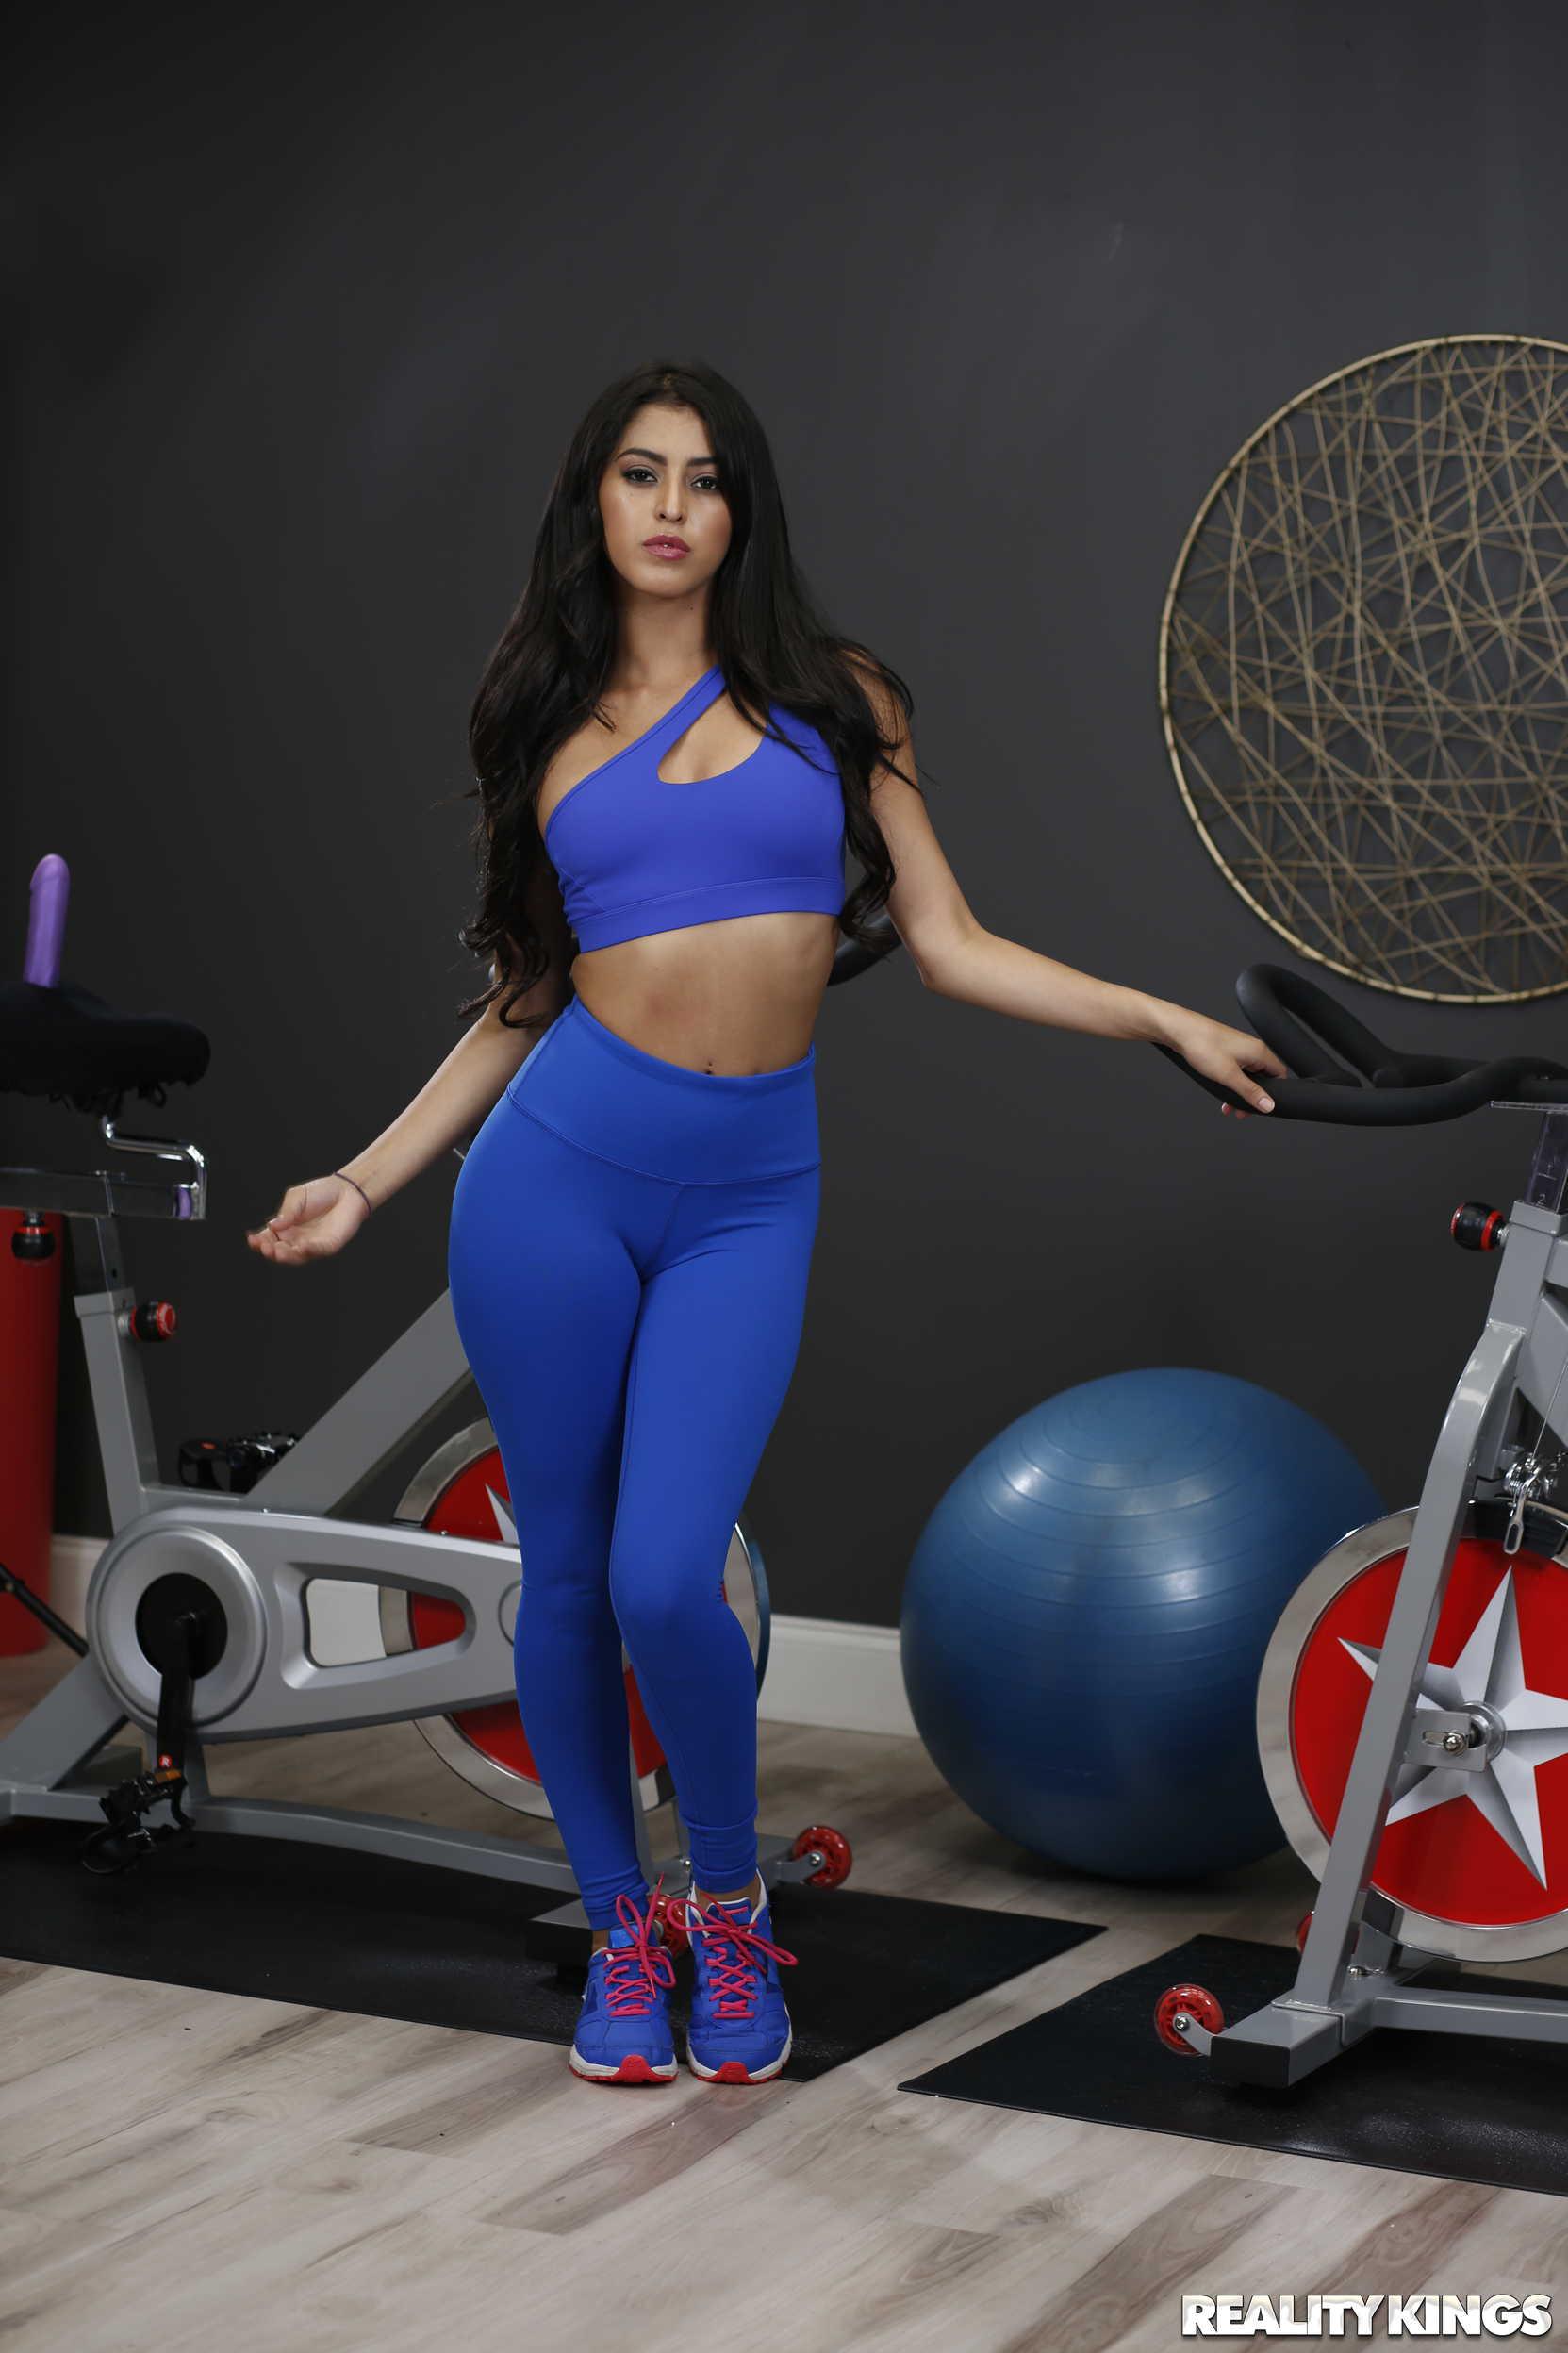 Reality Kings 'Dual Dildocycles' starring Sophia Leone (Photo 1)